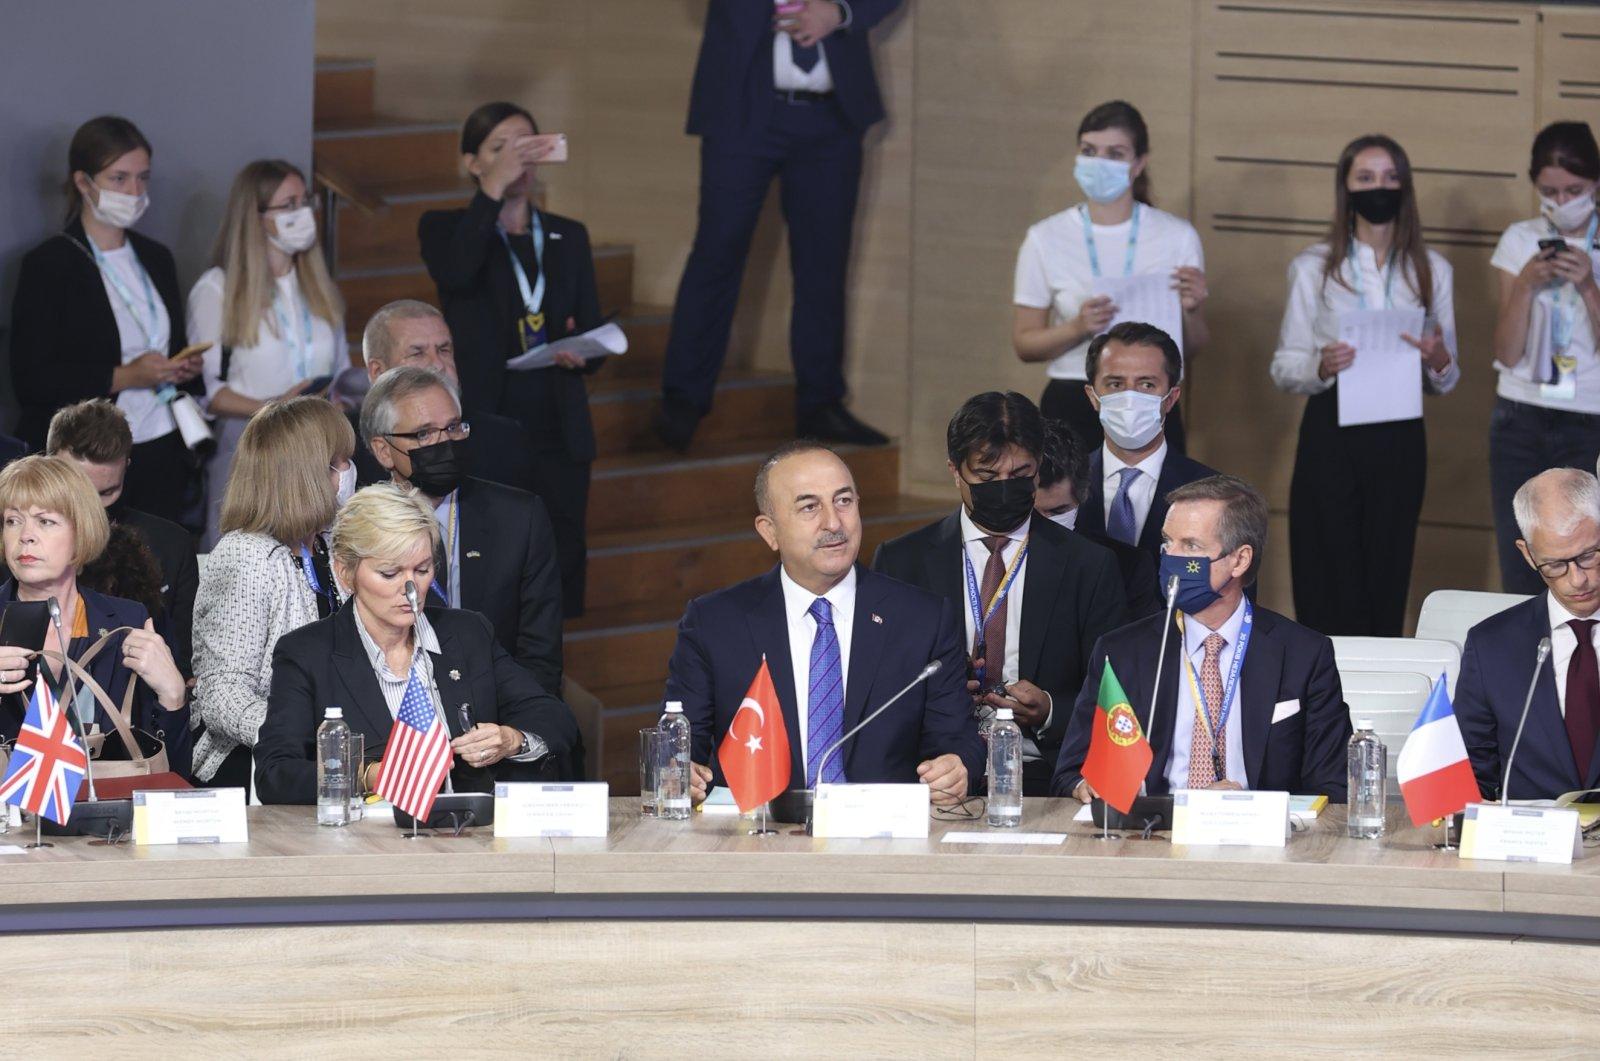 Foreign Minister Mevlüt Çavuşoğlu (C) represents Turkey at the Crimean Platform Summit in Kyiv, Ukraine, Aug. 23, 2021. (AA Photo)